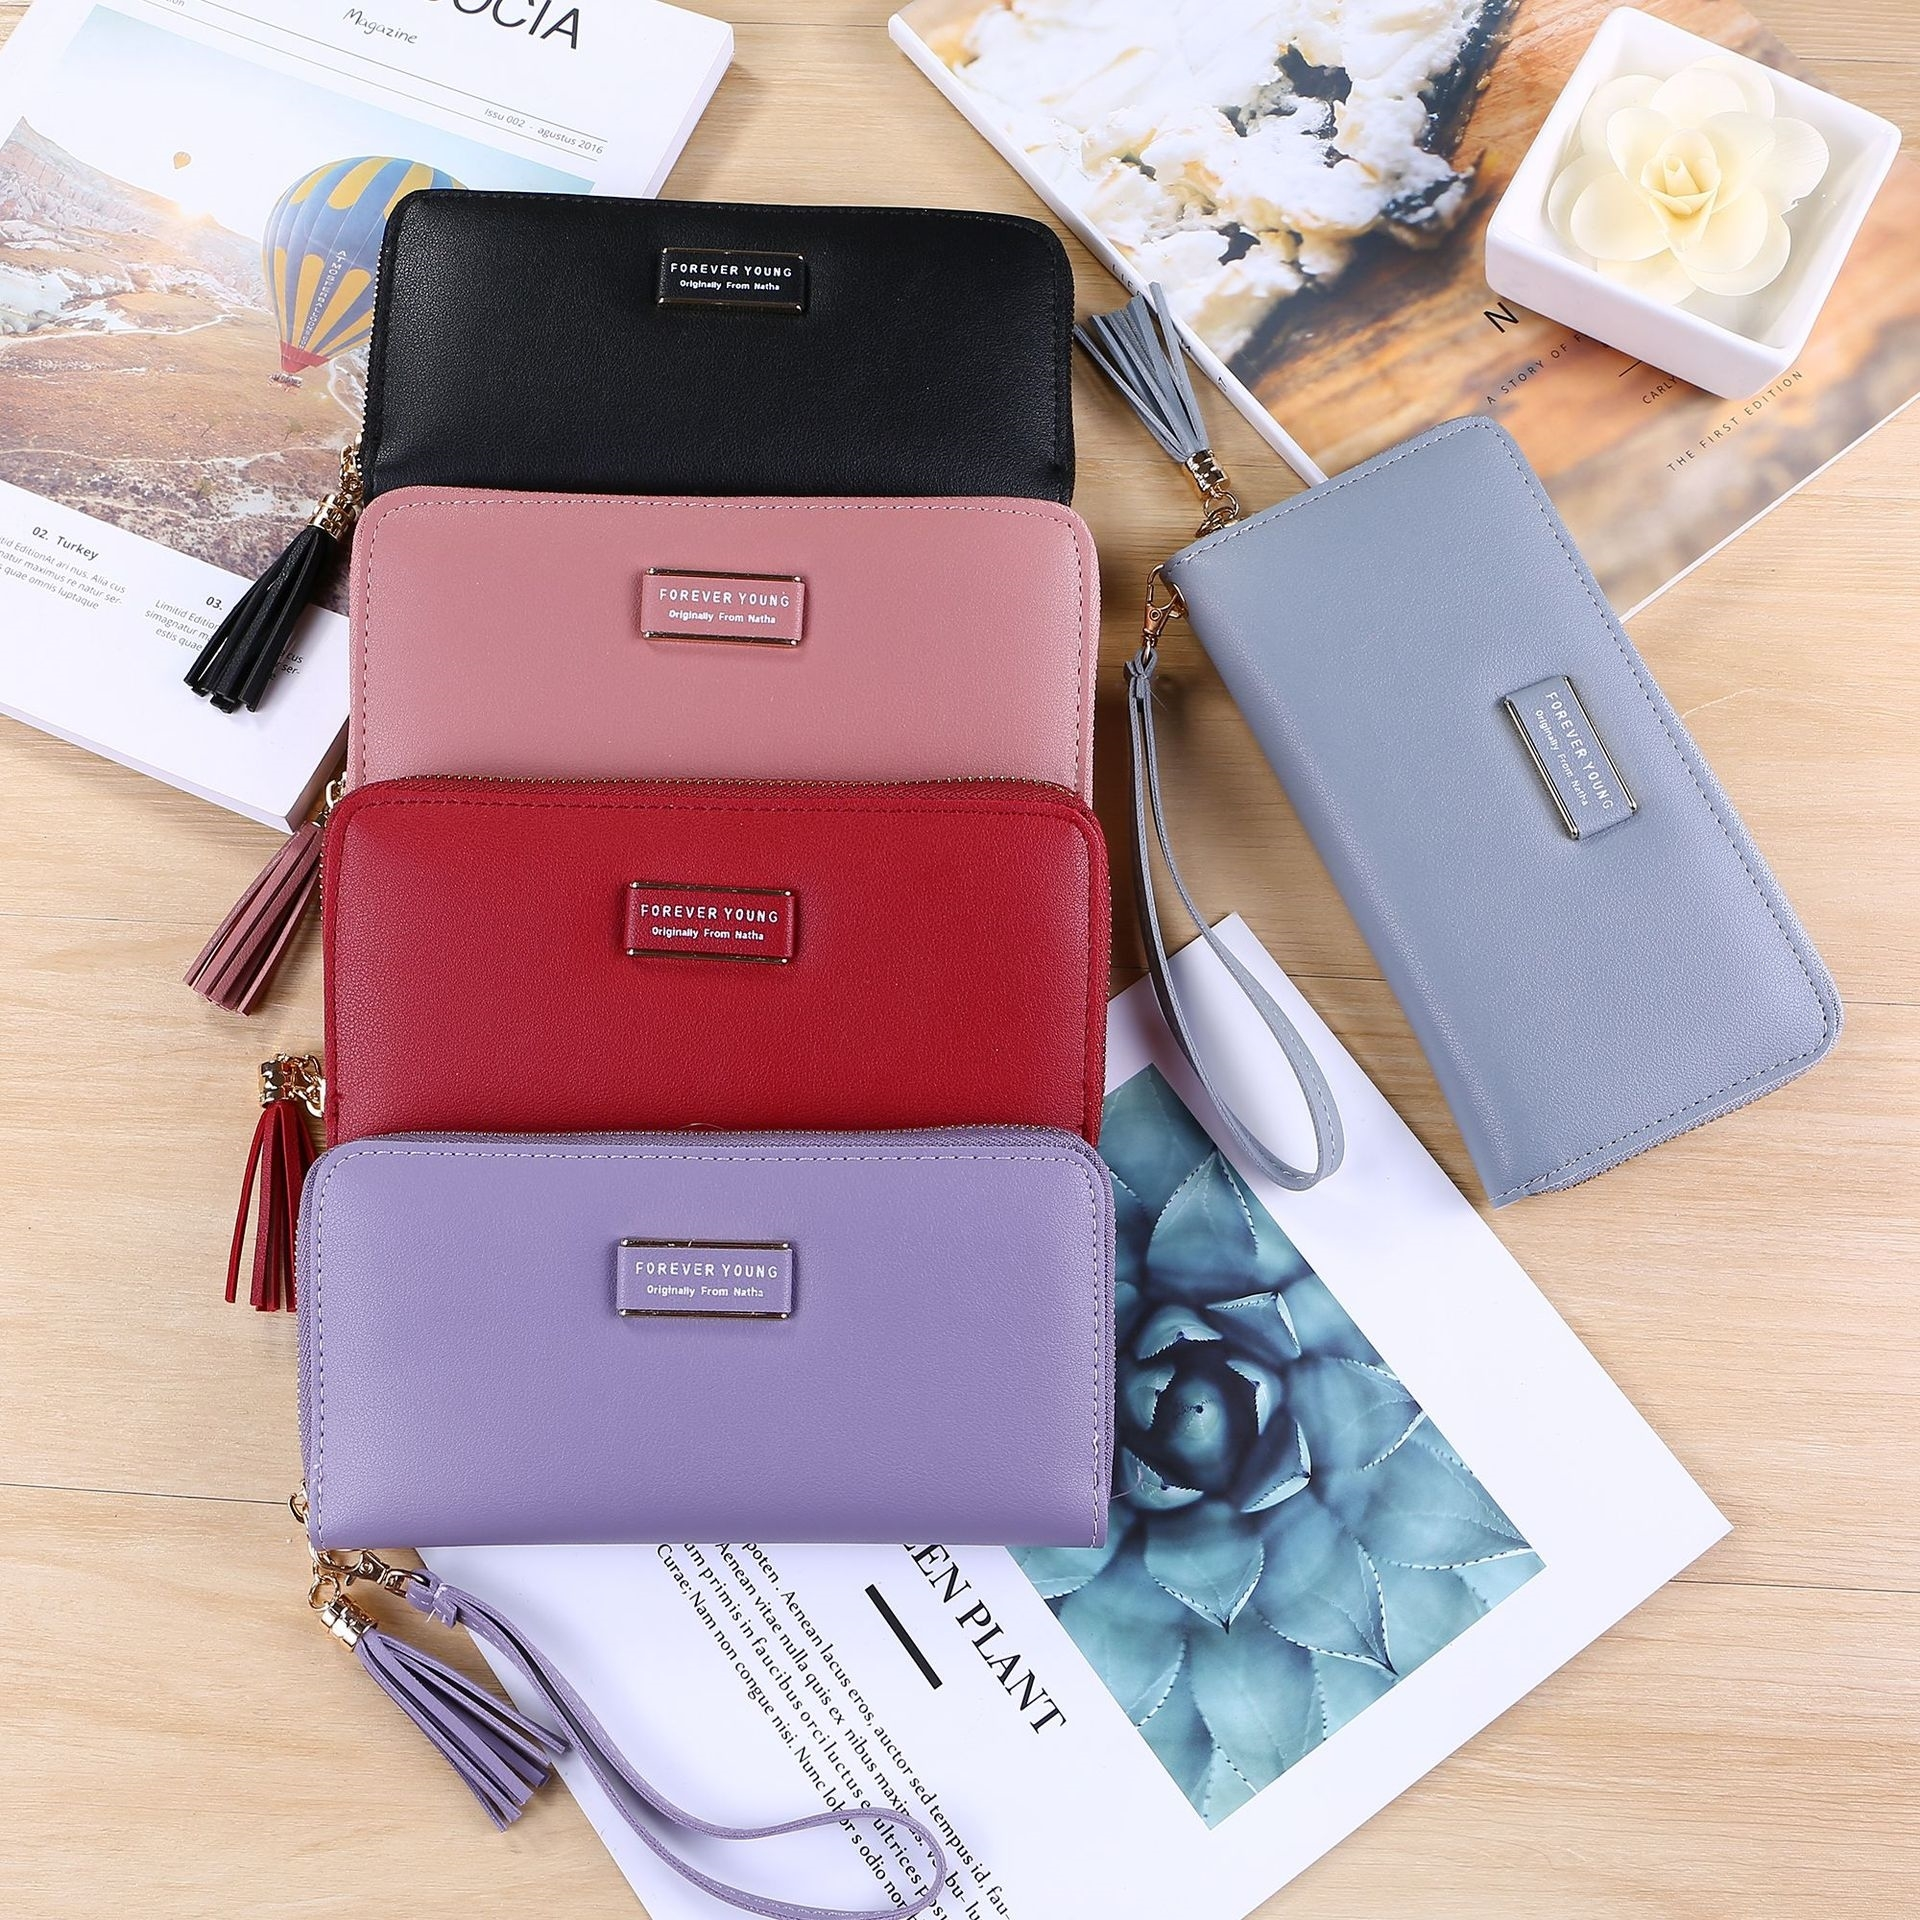 Women 39 s Single Pull Wallet Korean Version Tassel Pendant Lychee Wallet Card Bag Phone Bag in Wallets from Luggage amp Bags